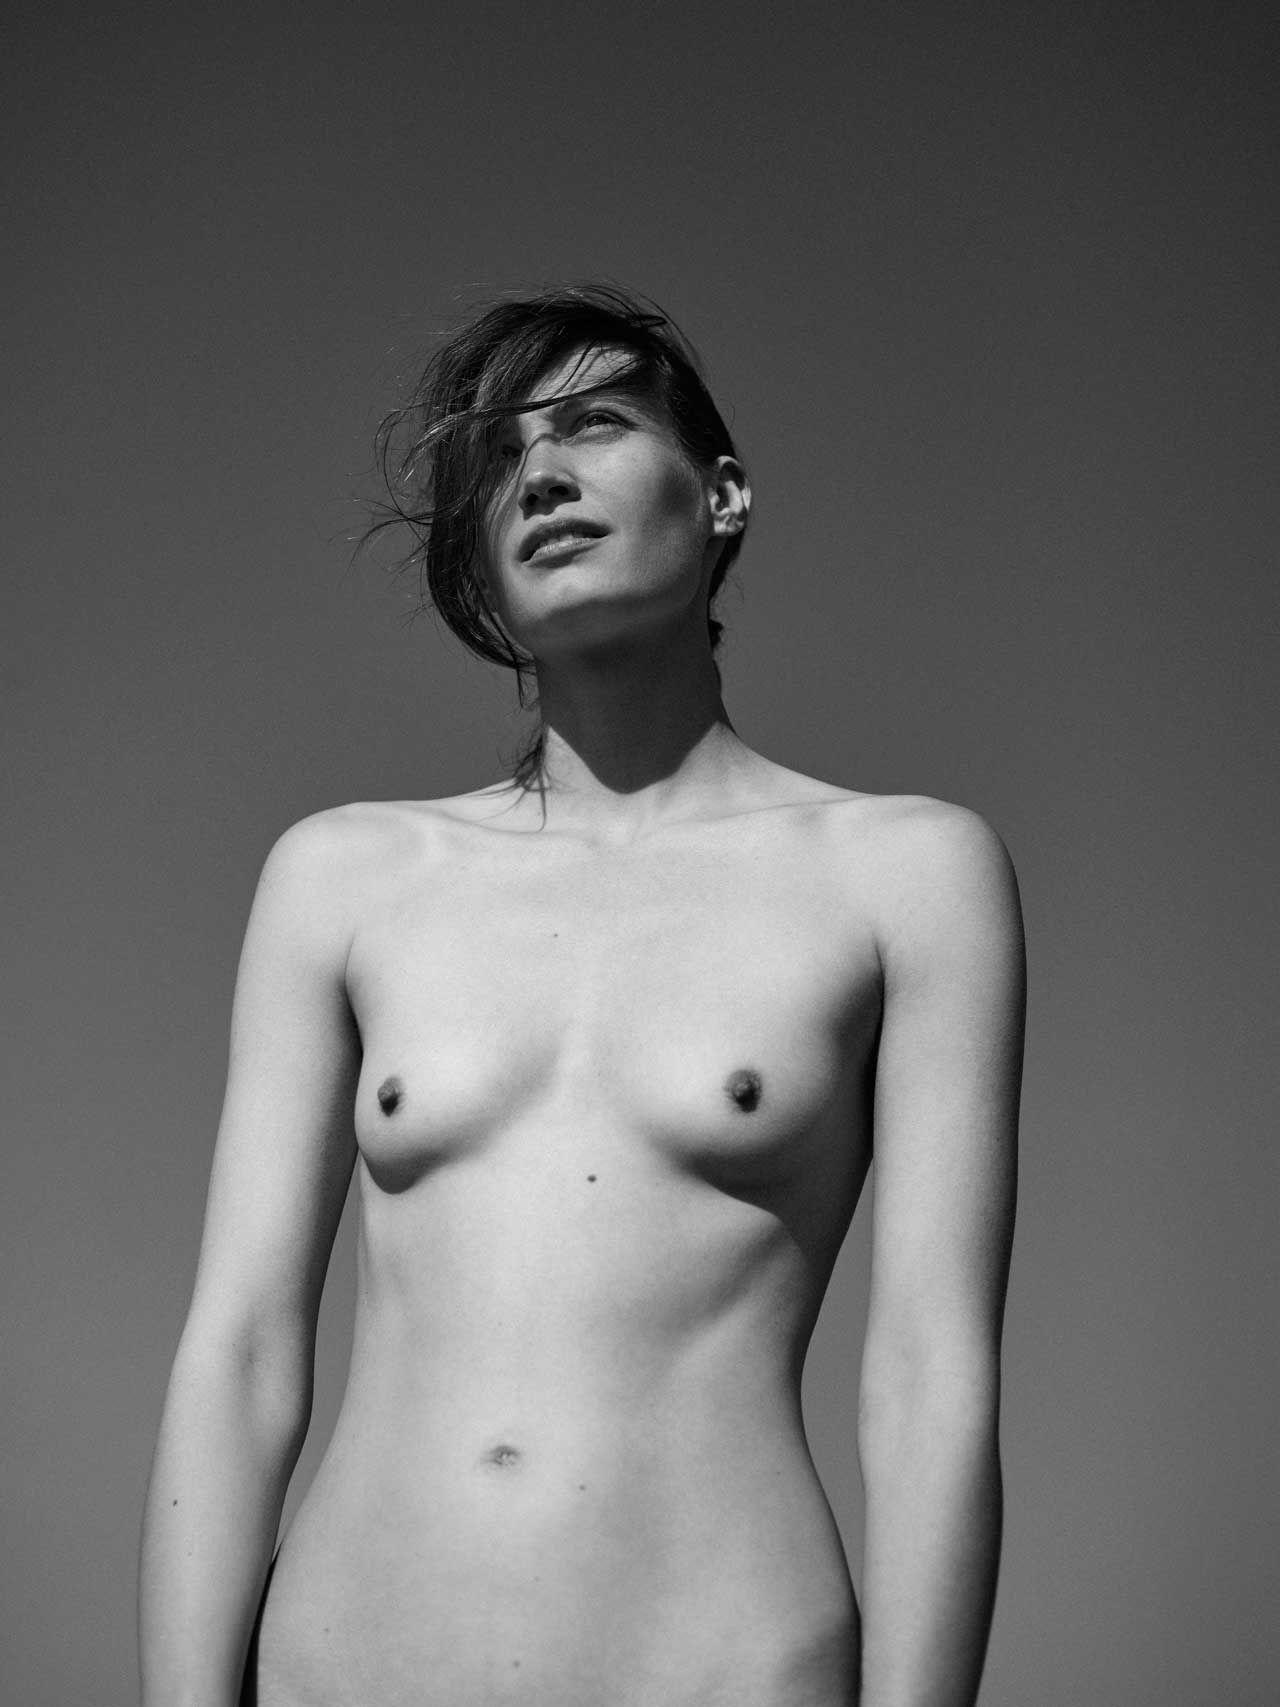 Epic burnette nude pron pics